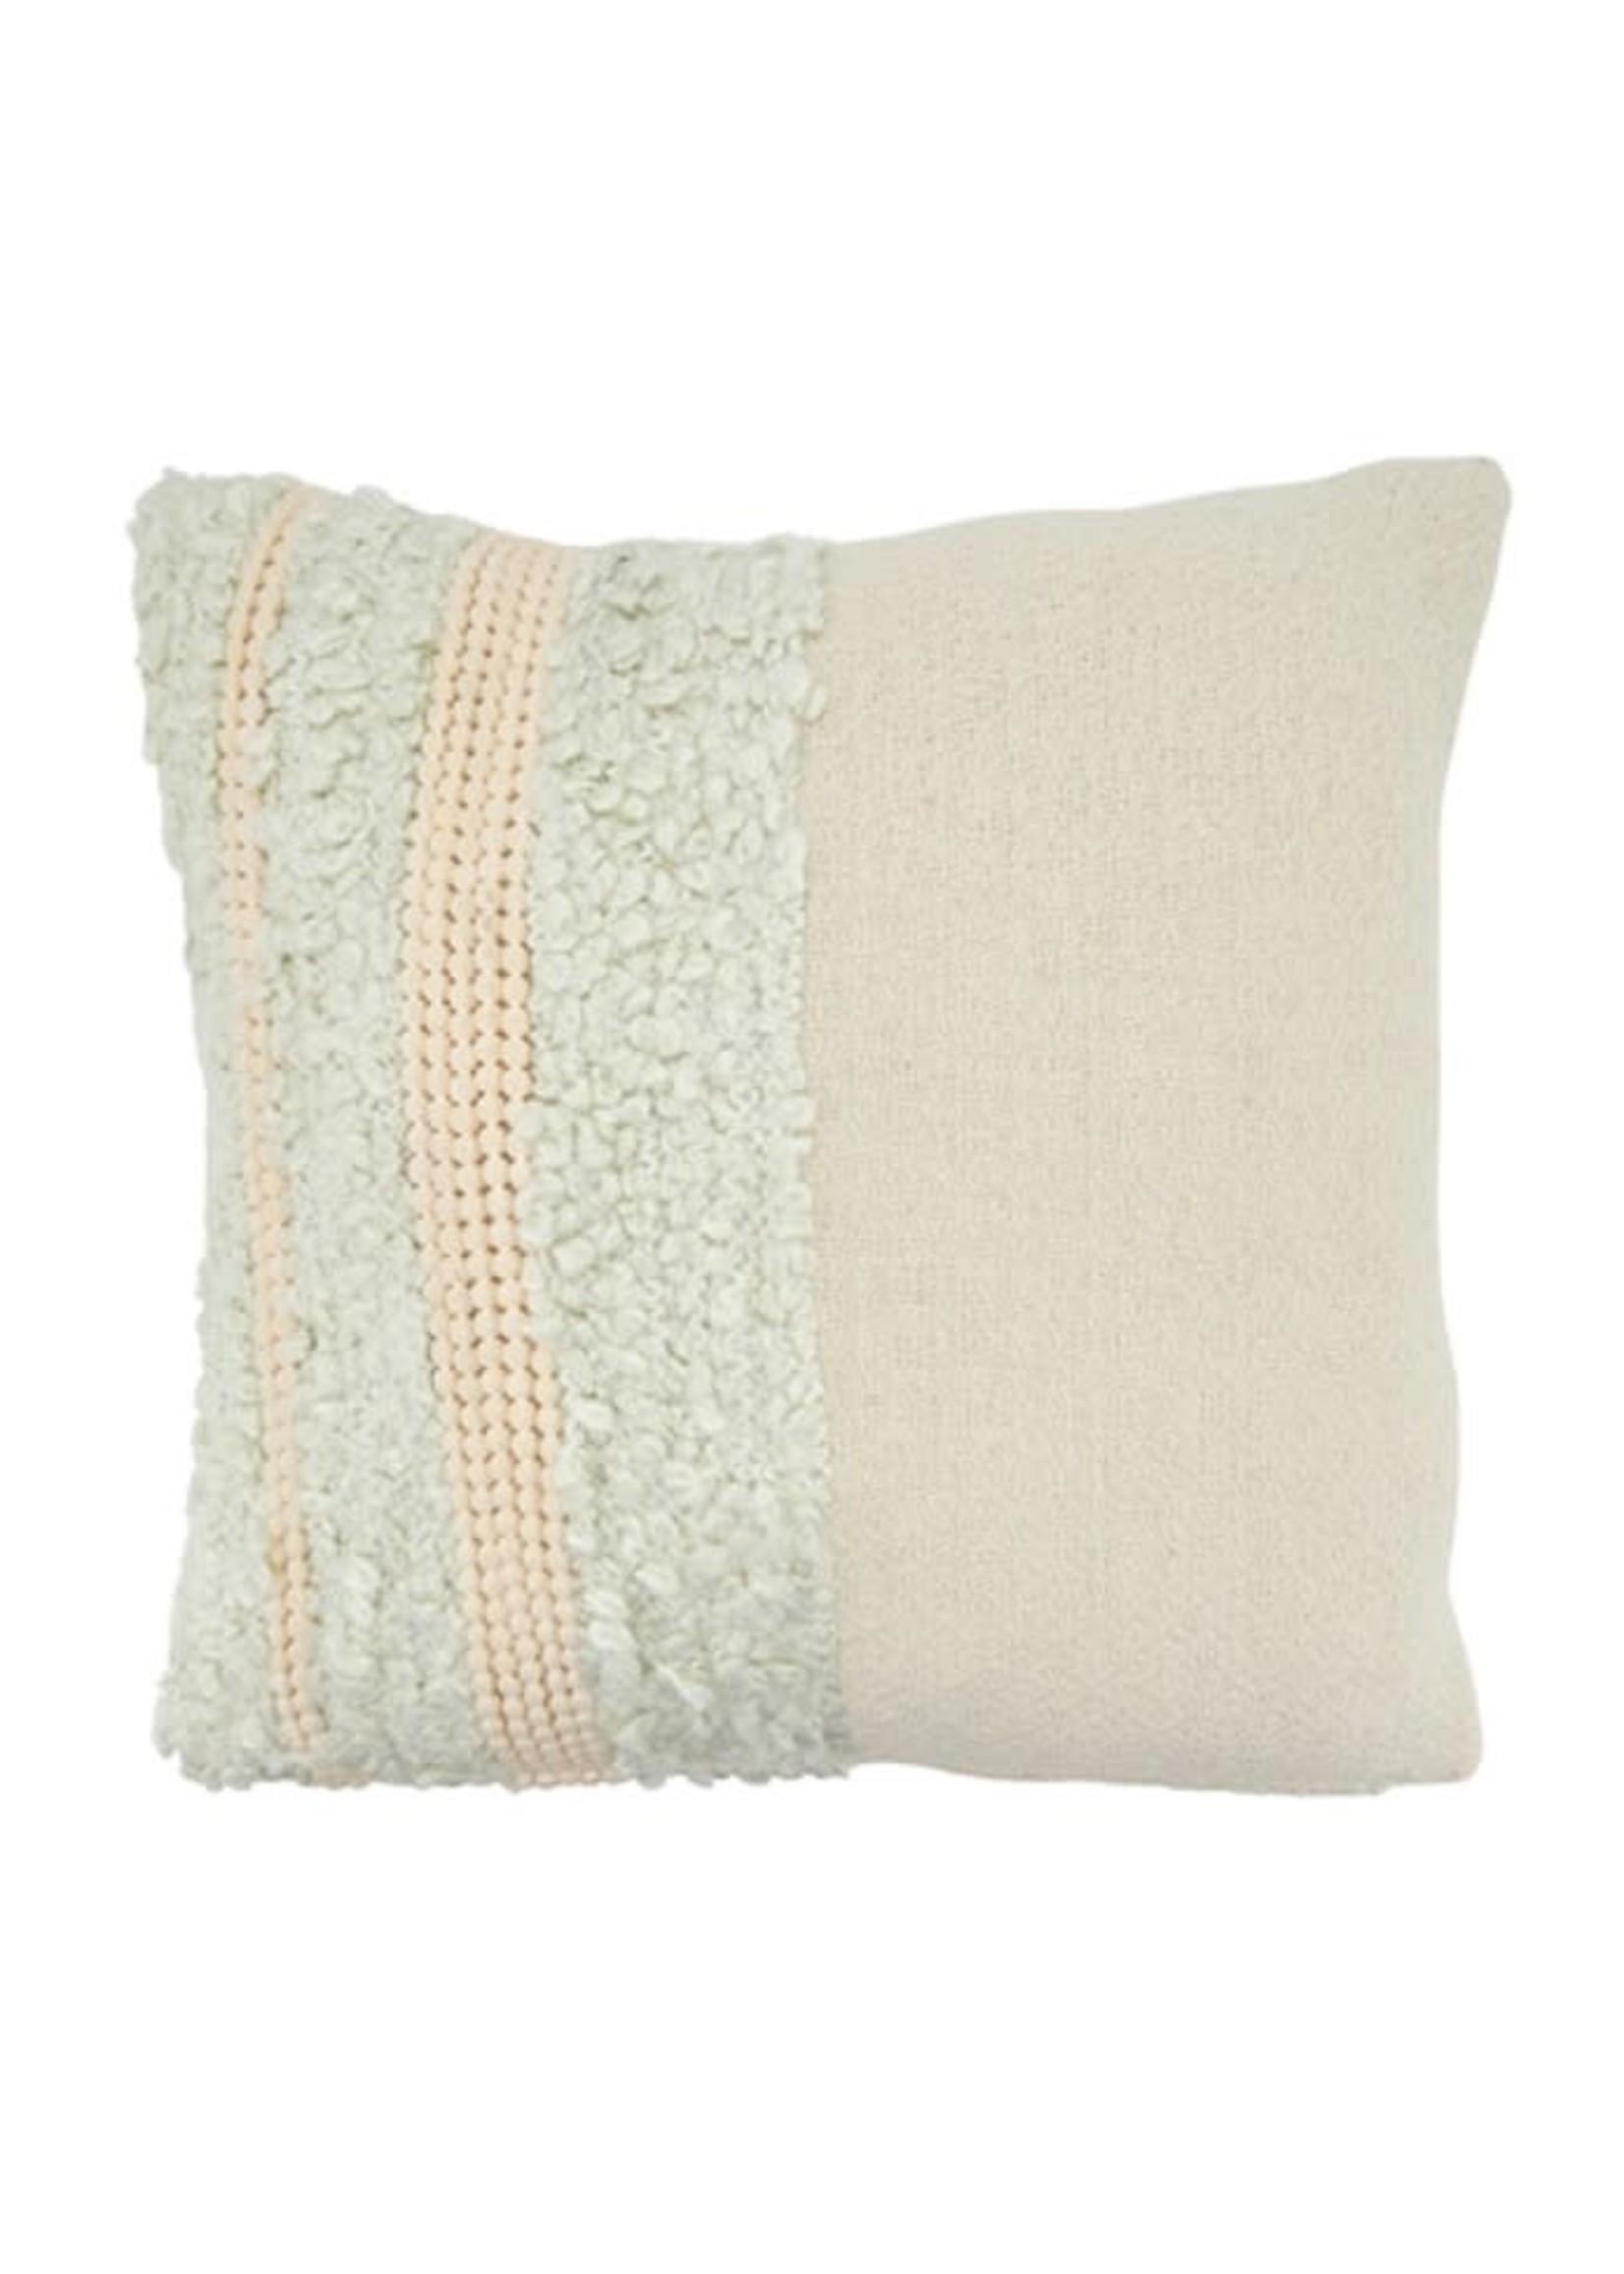 Saro SARO Pom Pom Applique Pillow Down Filled - Ivory